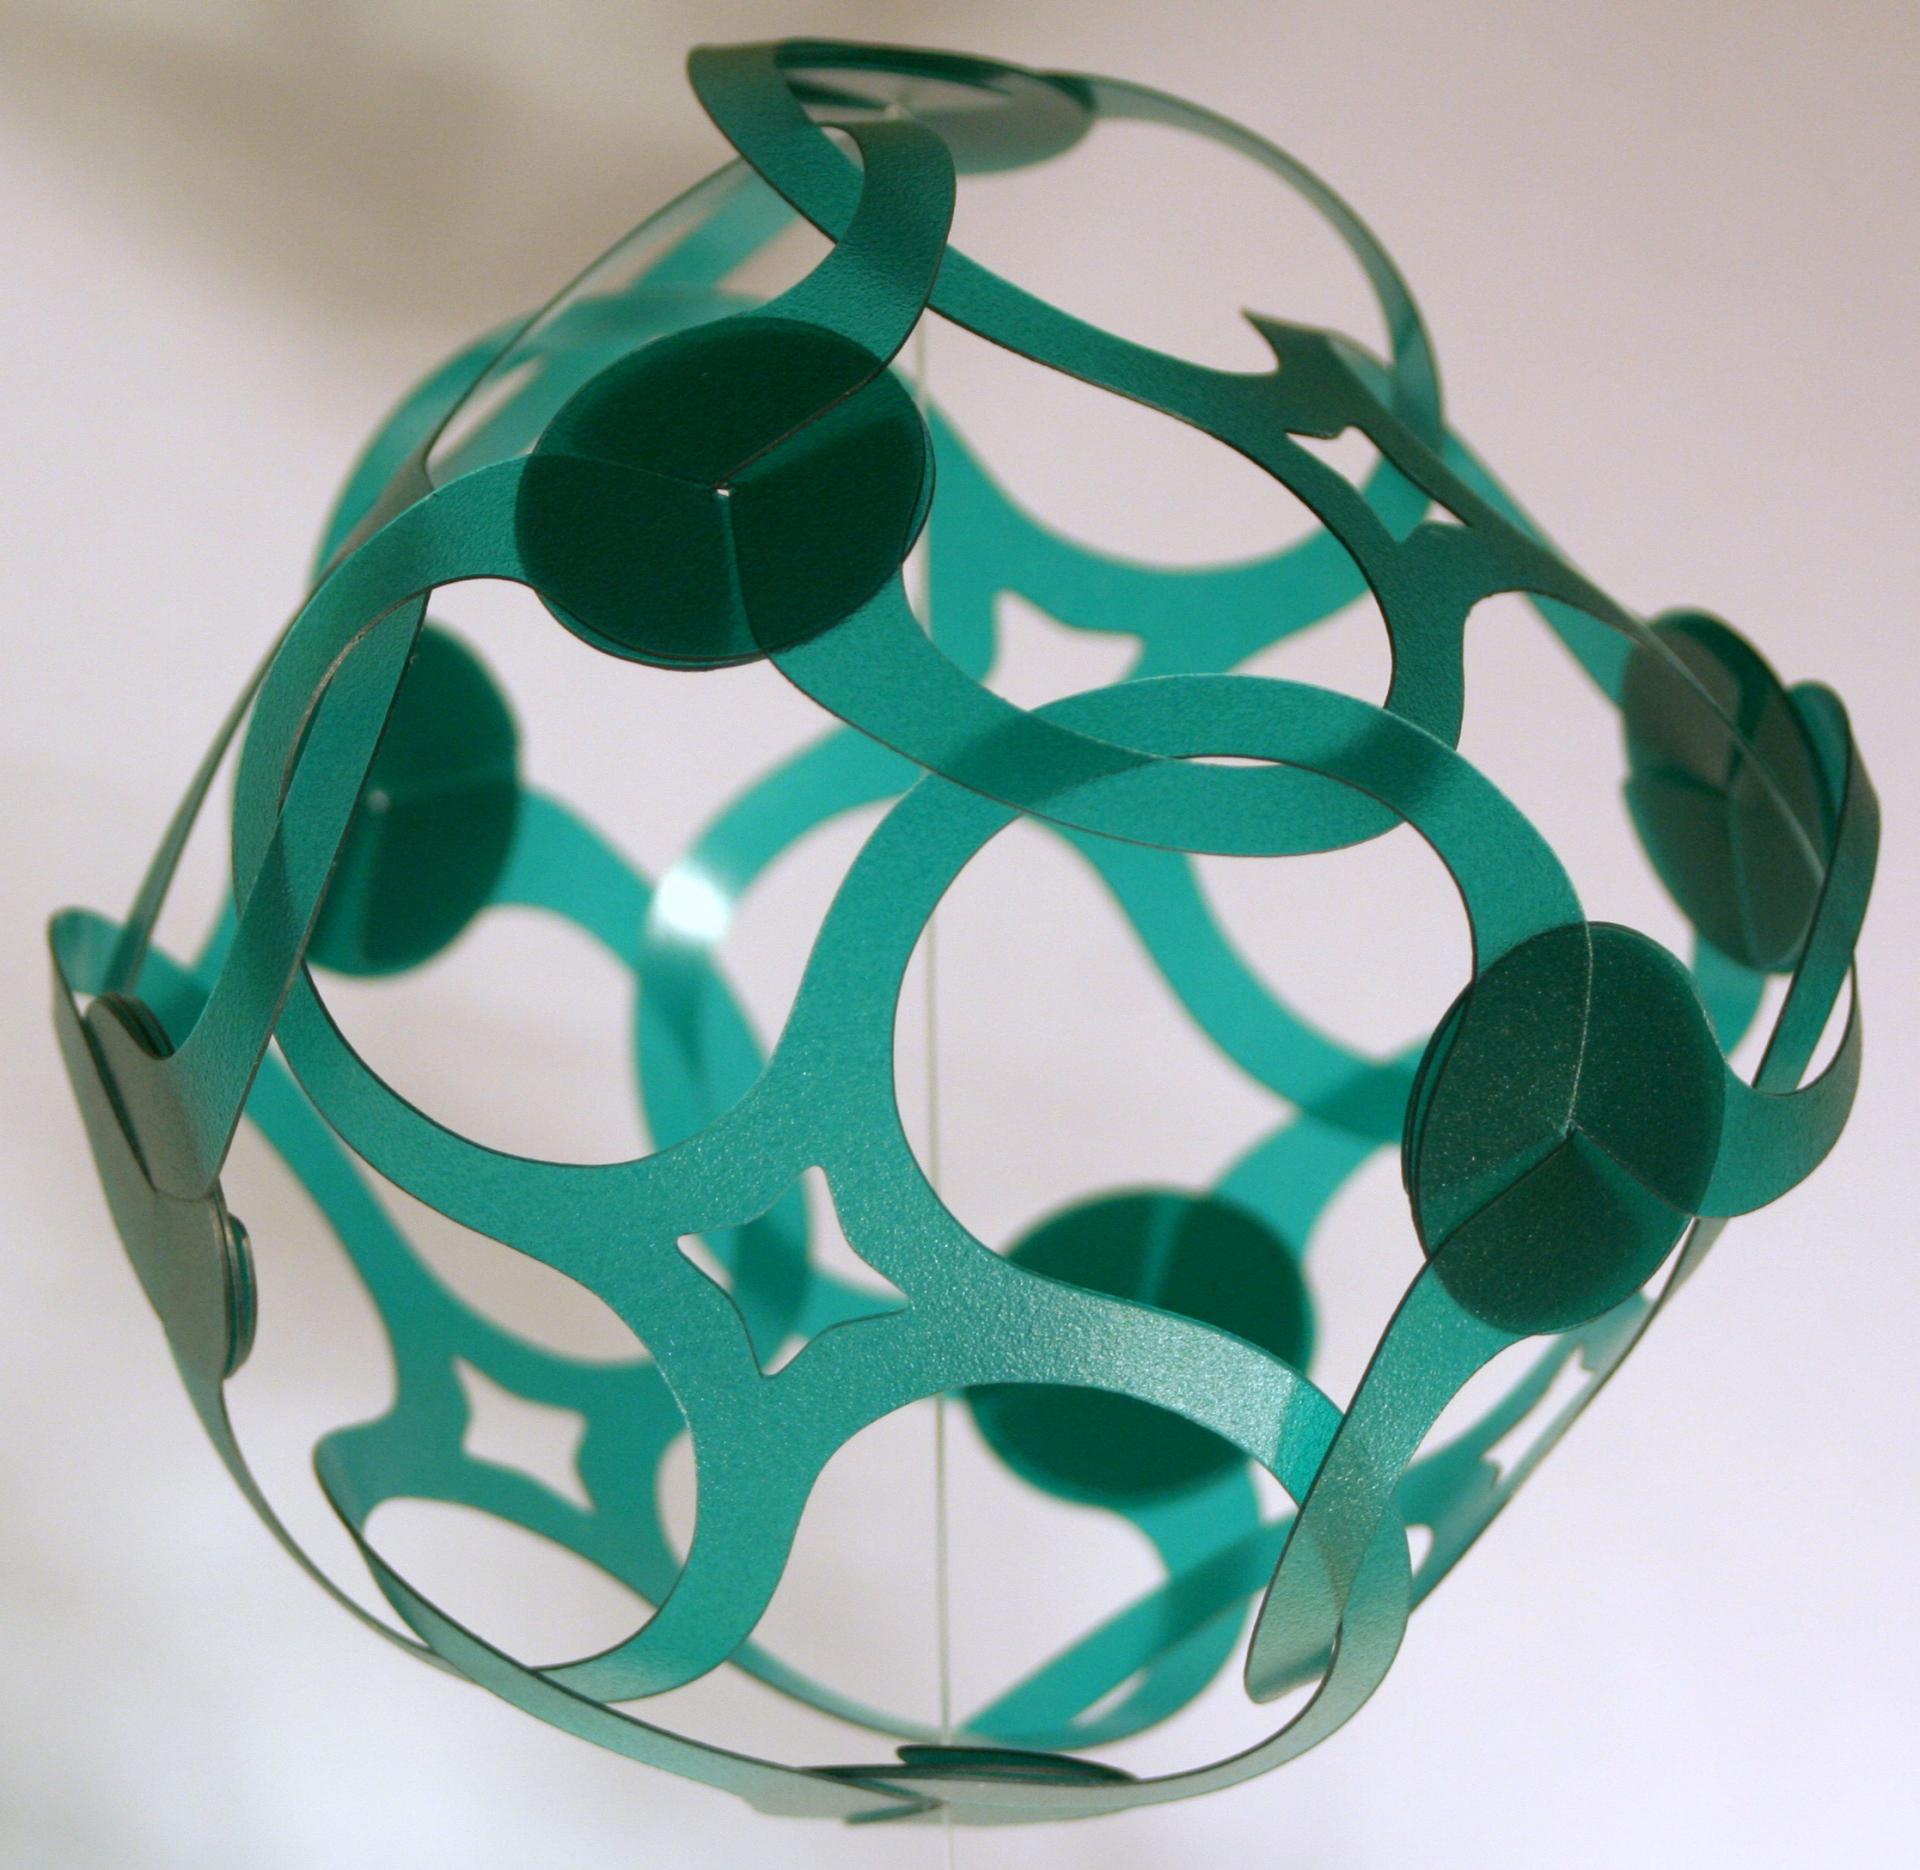 Tetrahedron + tetrahedron dual compound, Stella octangula